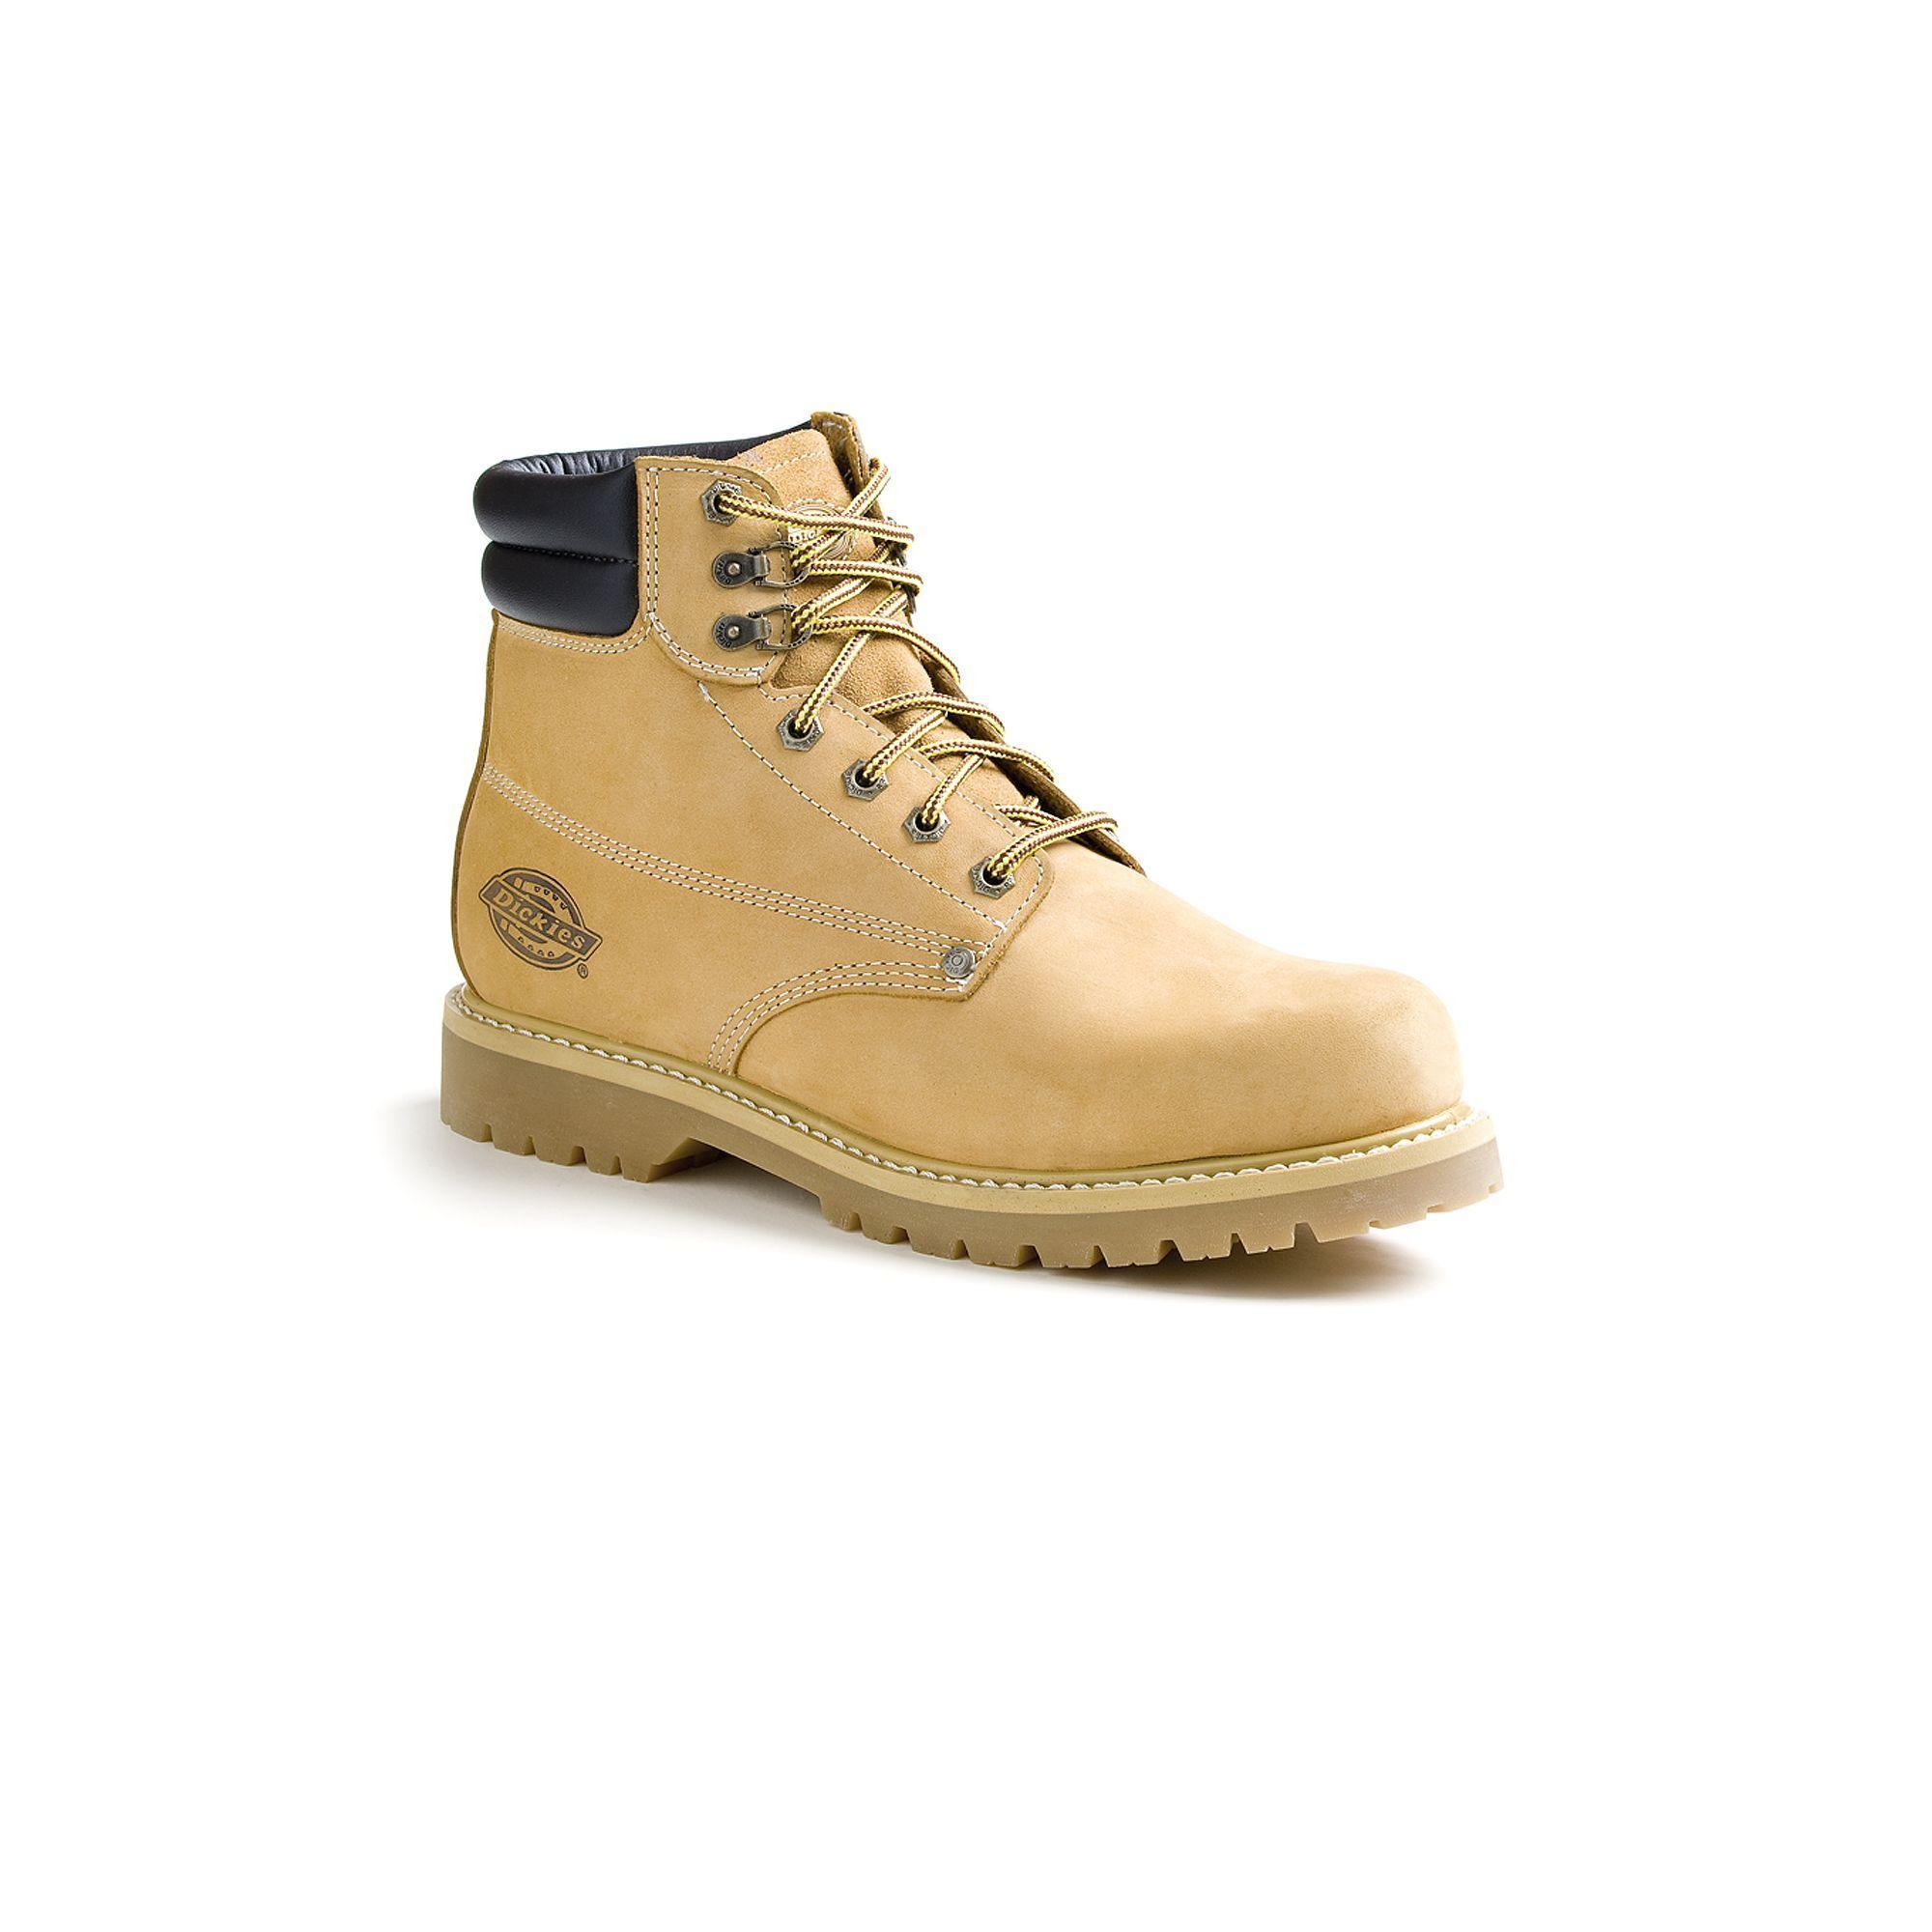 71662922e1 Dickies Raider Men's Steel-Toe Work Boots, Size: medium (10.5), Beig/Green  (Beig/Khaki), Durable